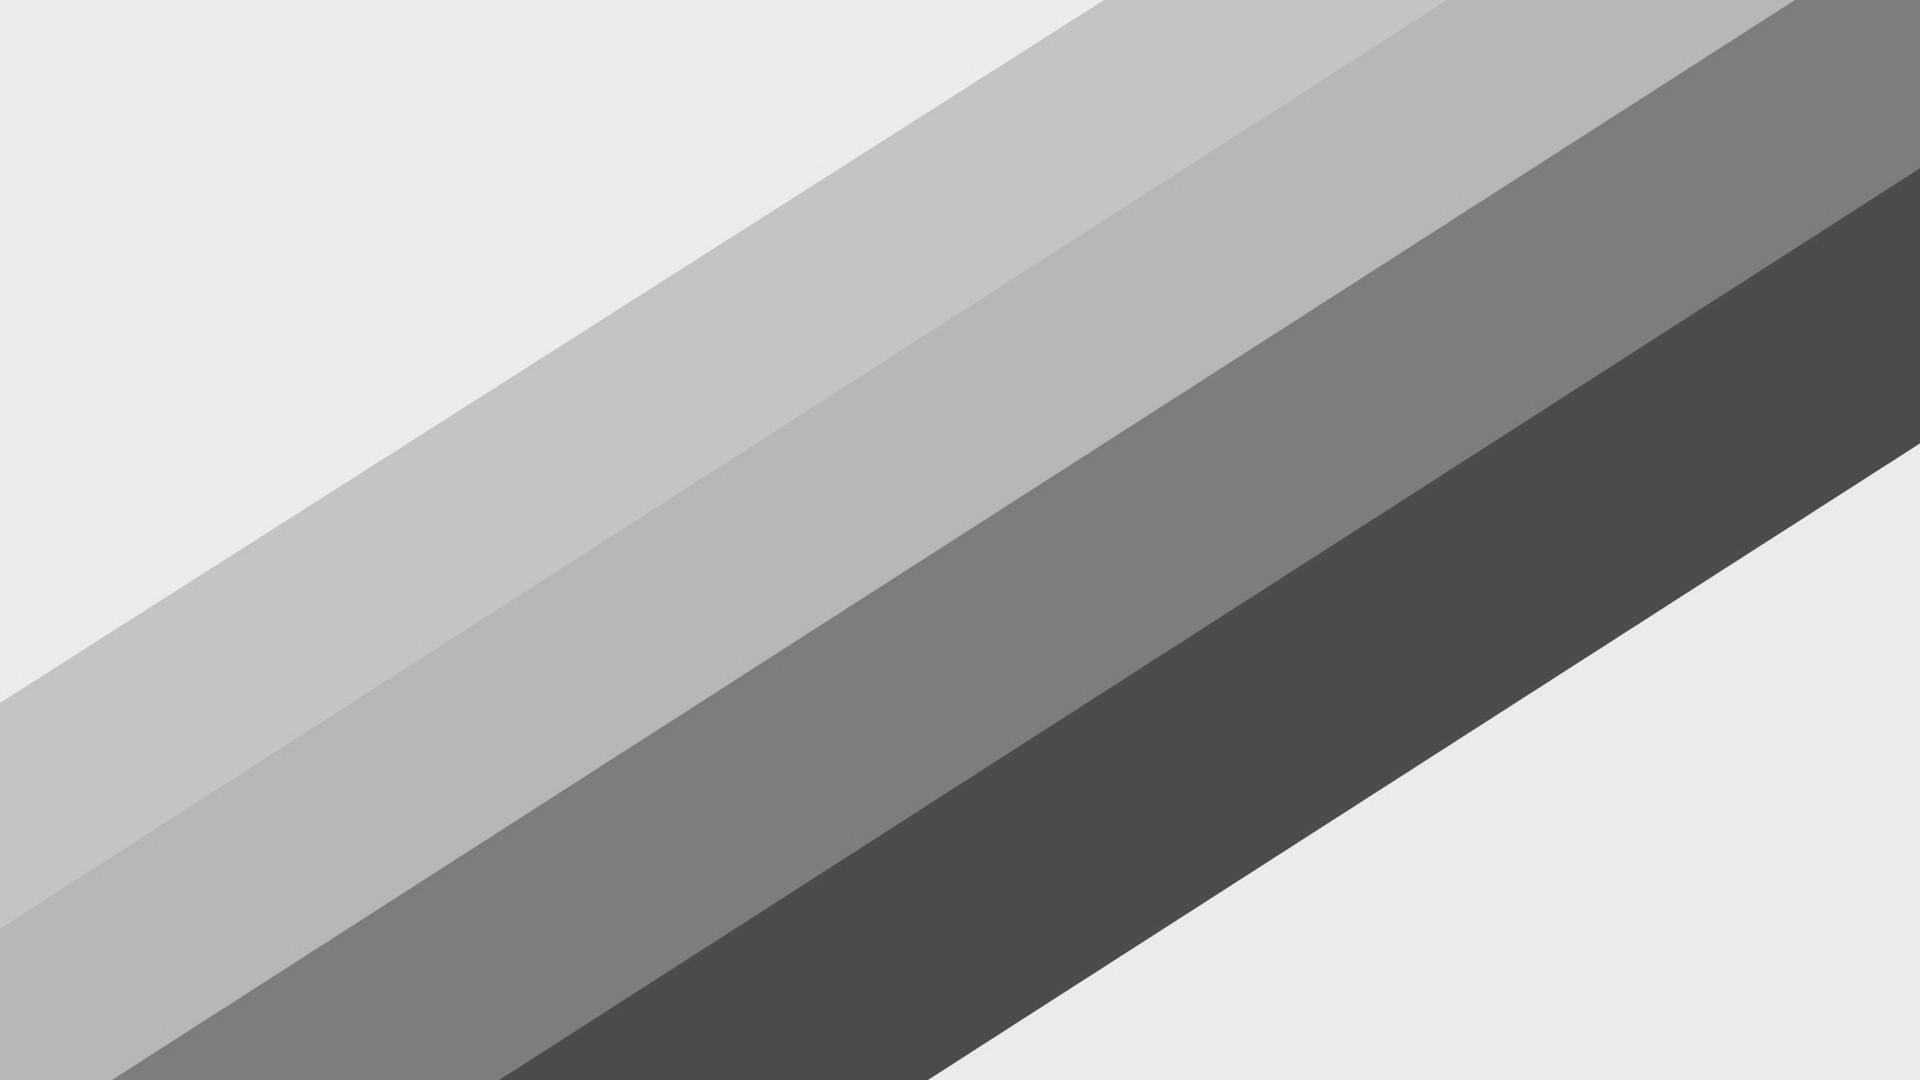 Minimalistic Stripes Background